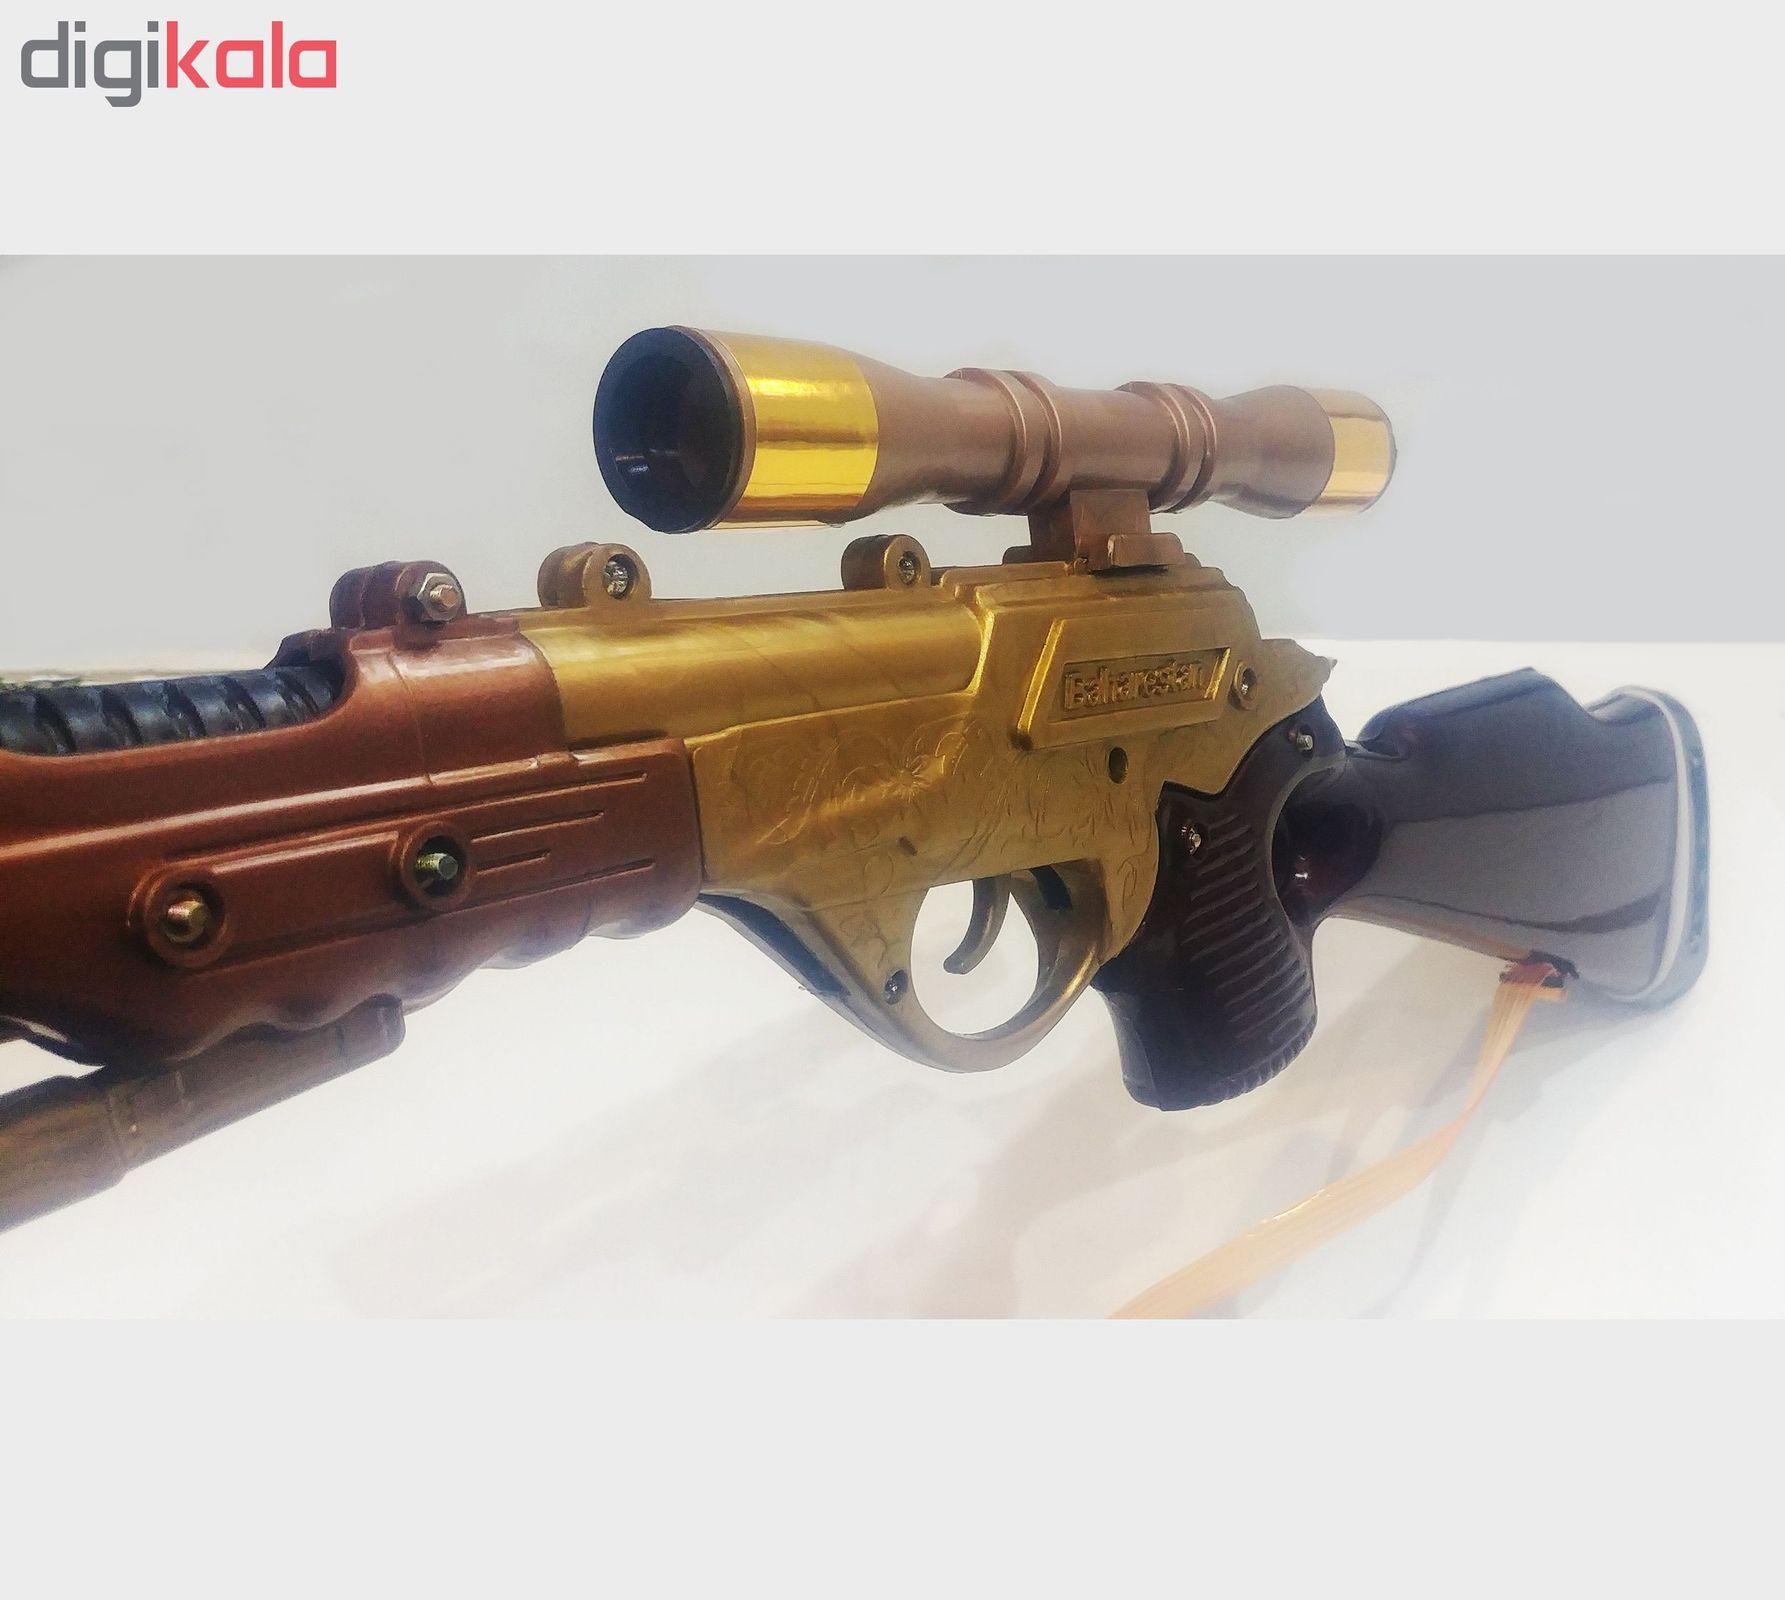 تفنگ بازی مدل Hornet 168 main 1 2